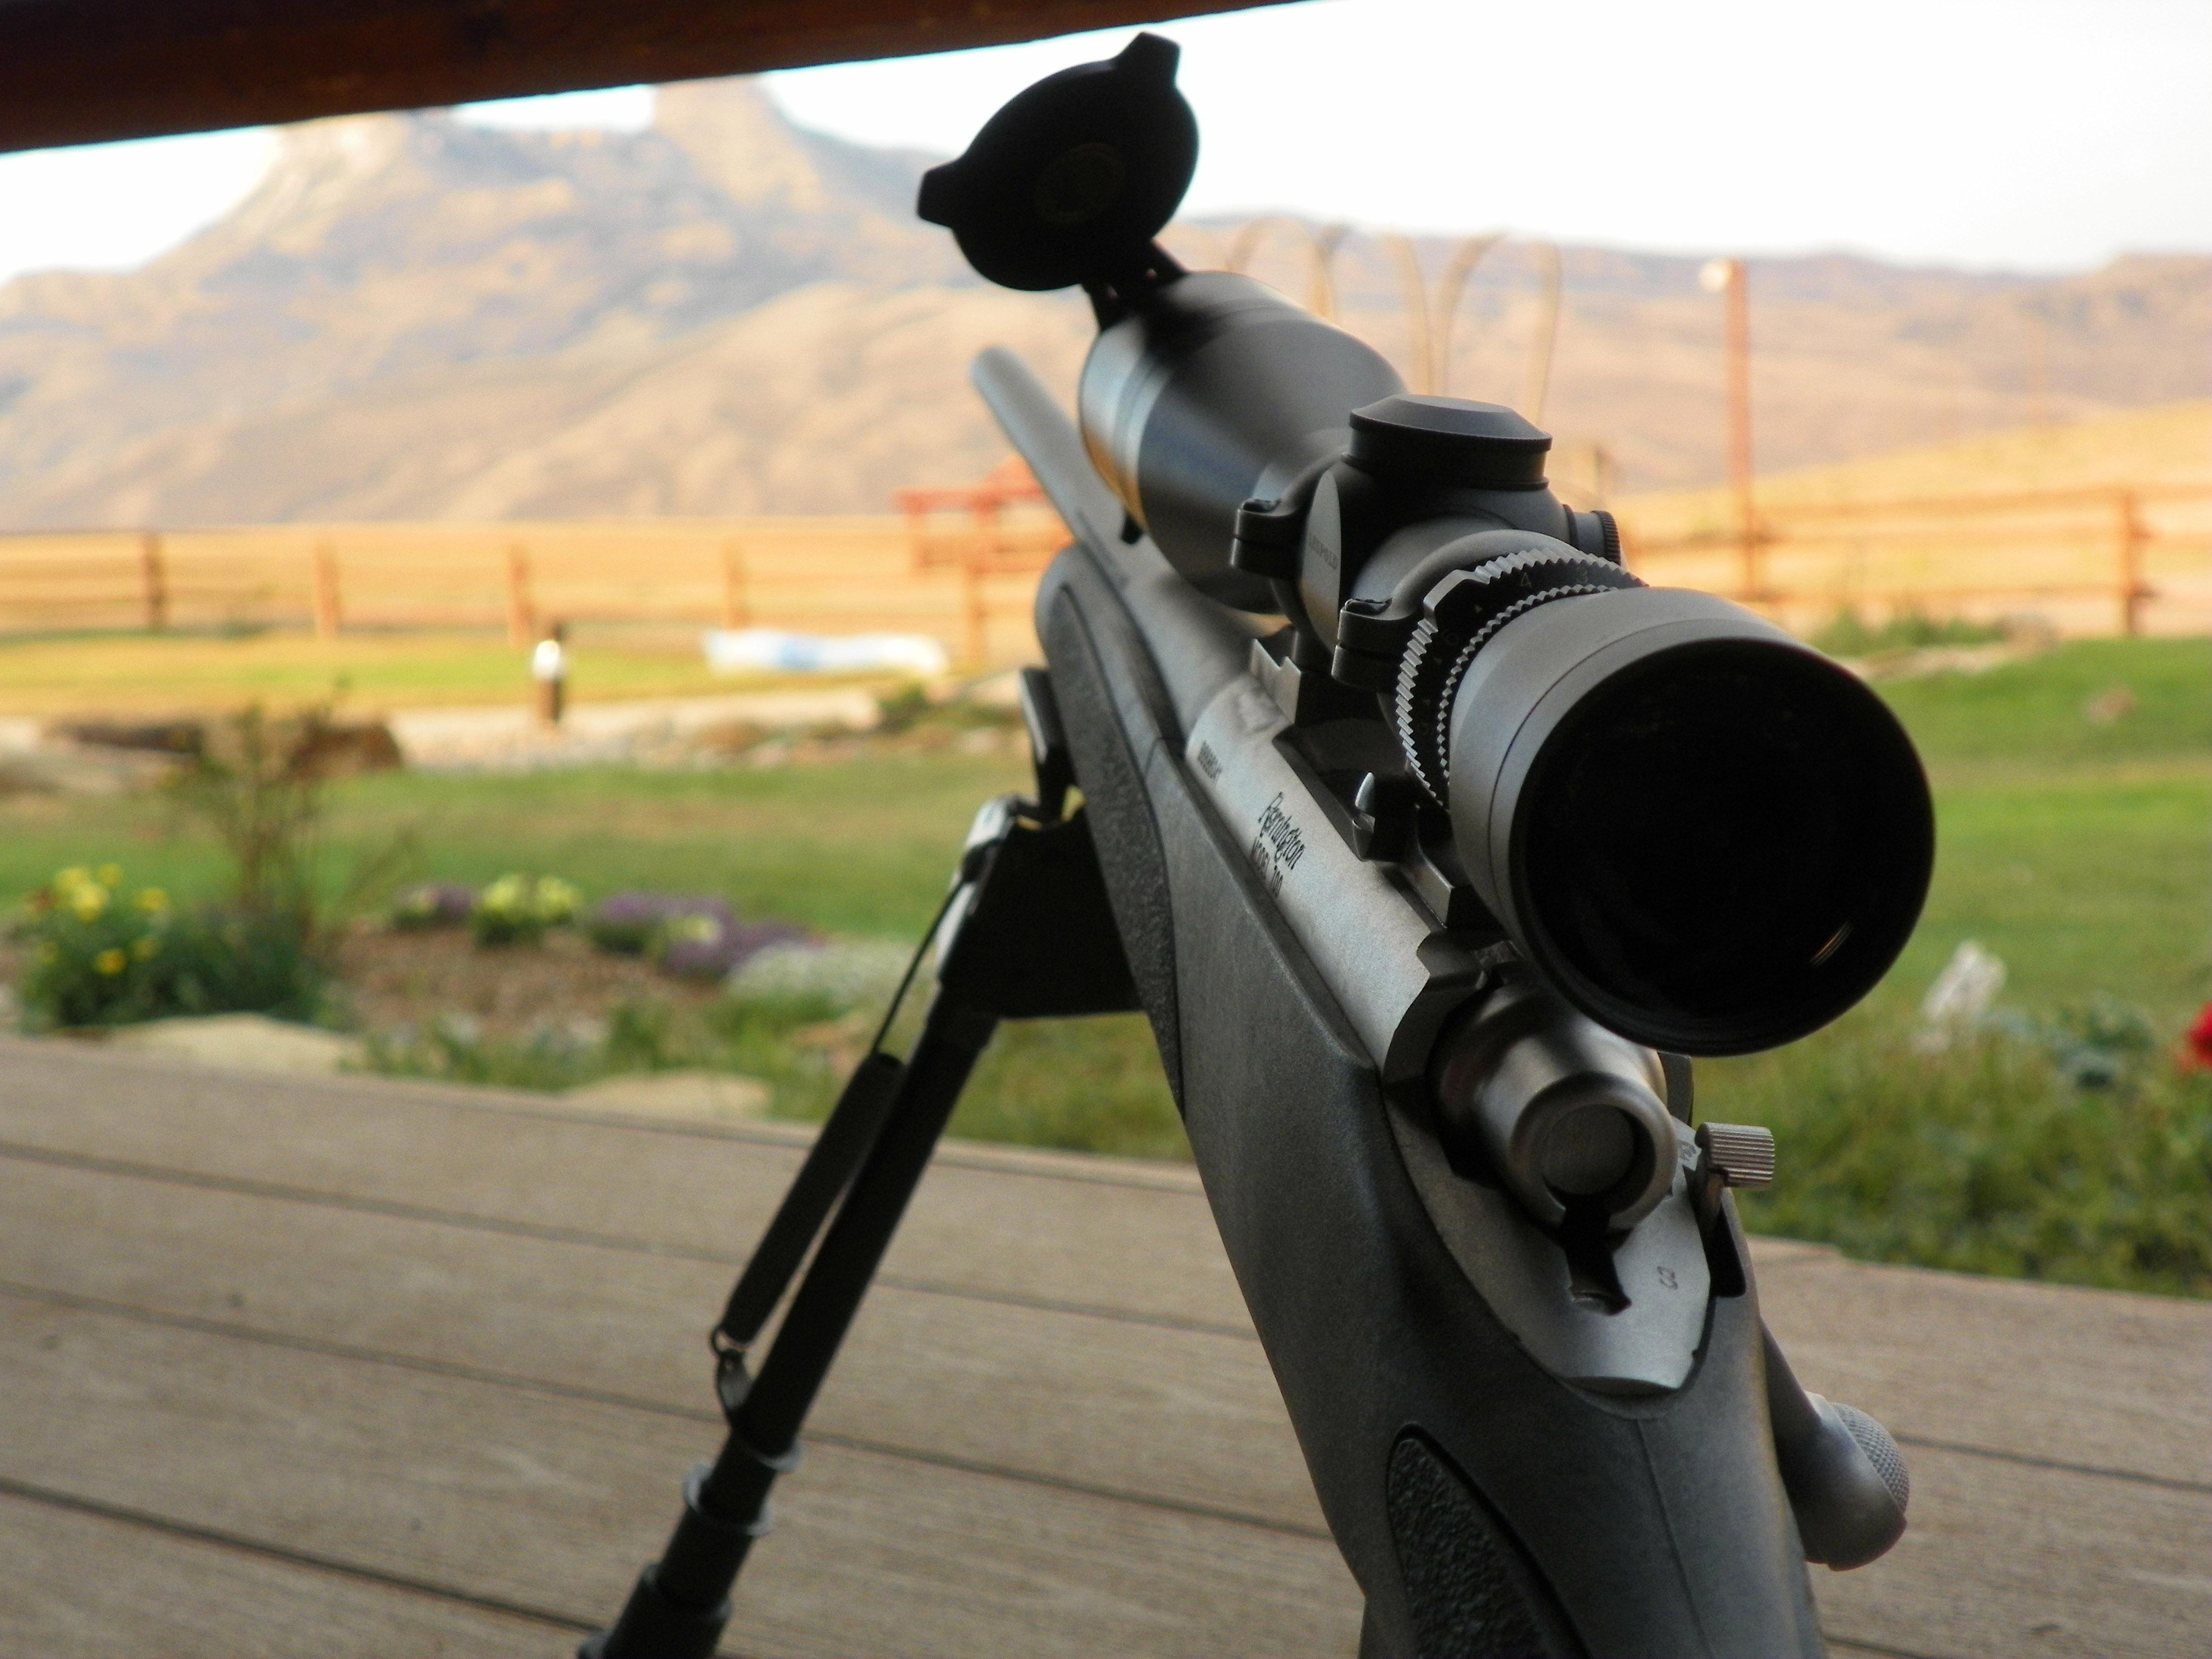 Sniper Rifle Computer Wallpapers Desktop Backgrounds 4288x3216 ID 4288x3216